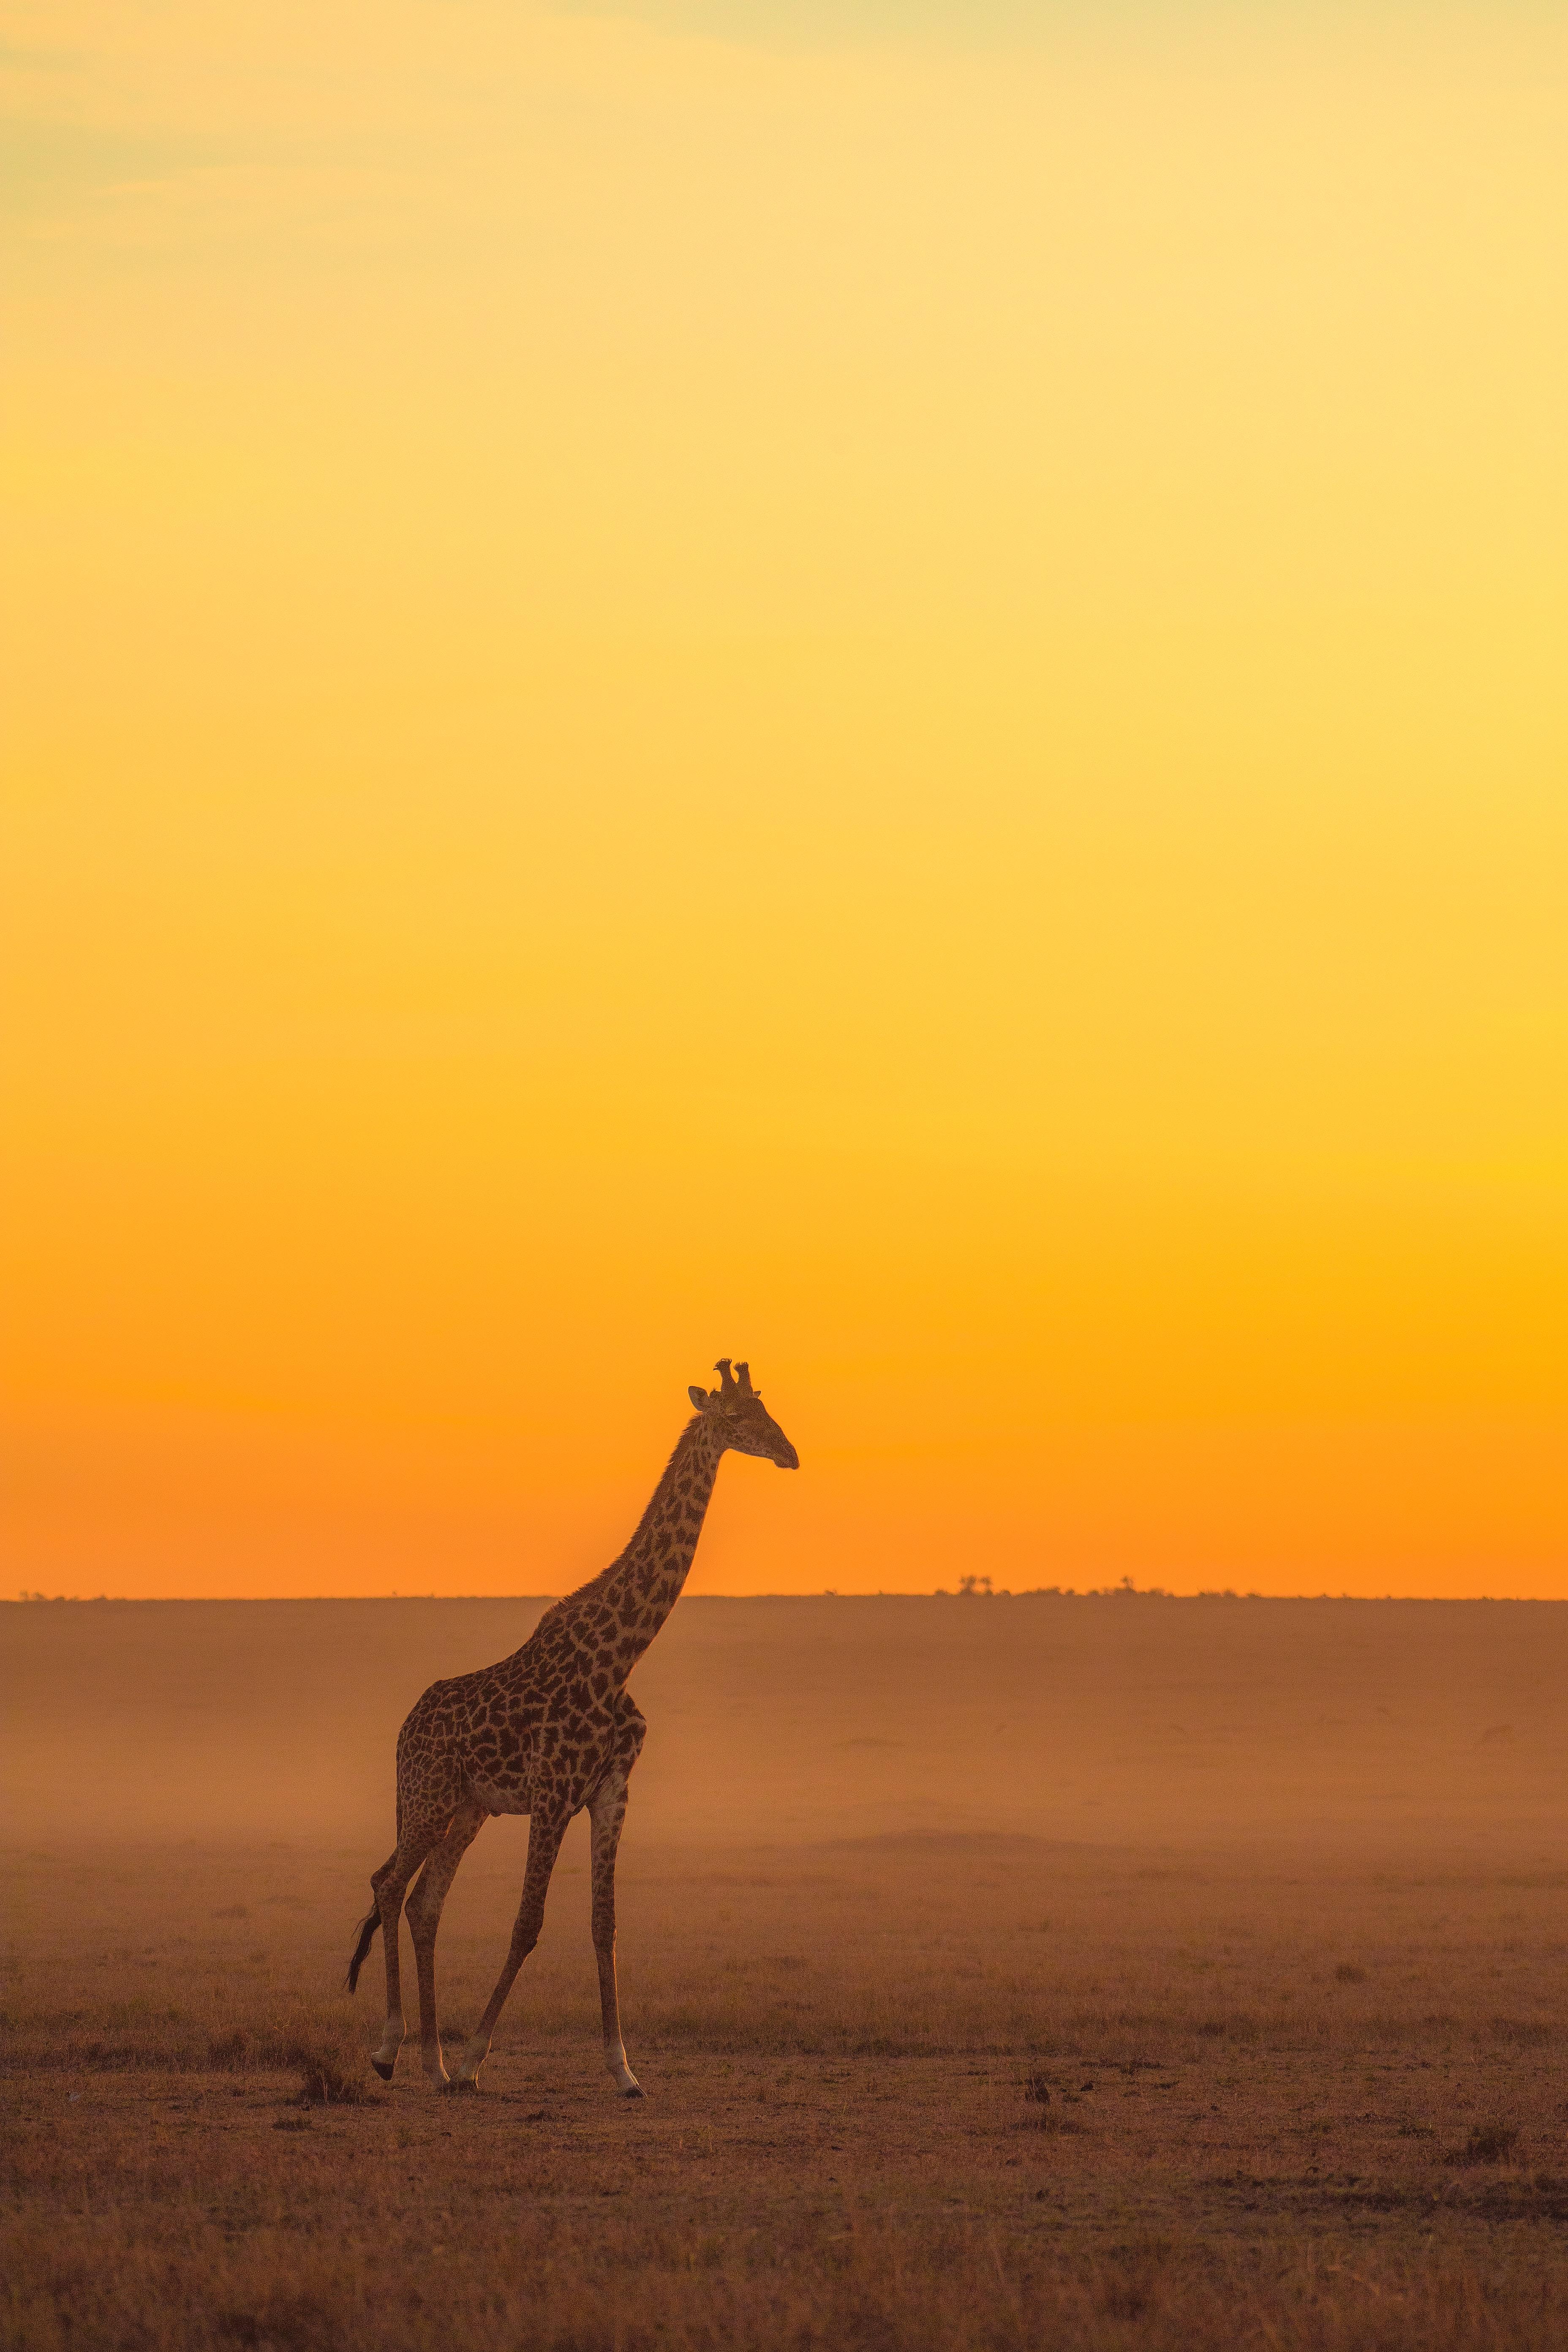 83657 download wallpaper Animals, Giraffe, Animal, Safari, Horizon screensavers and pictures for free